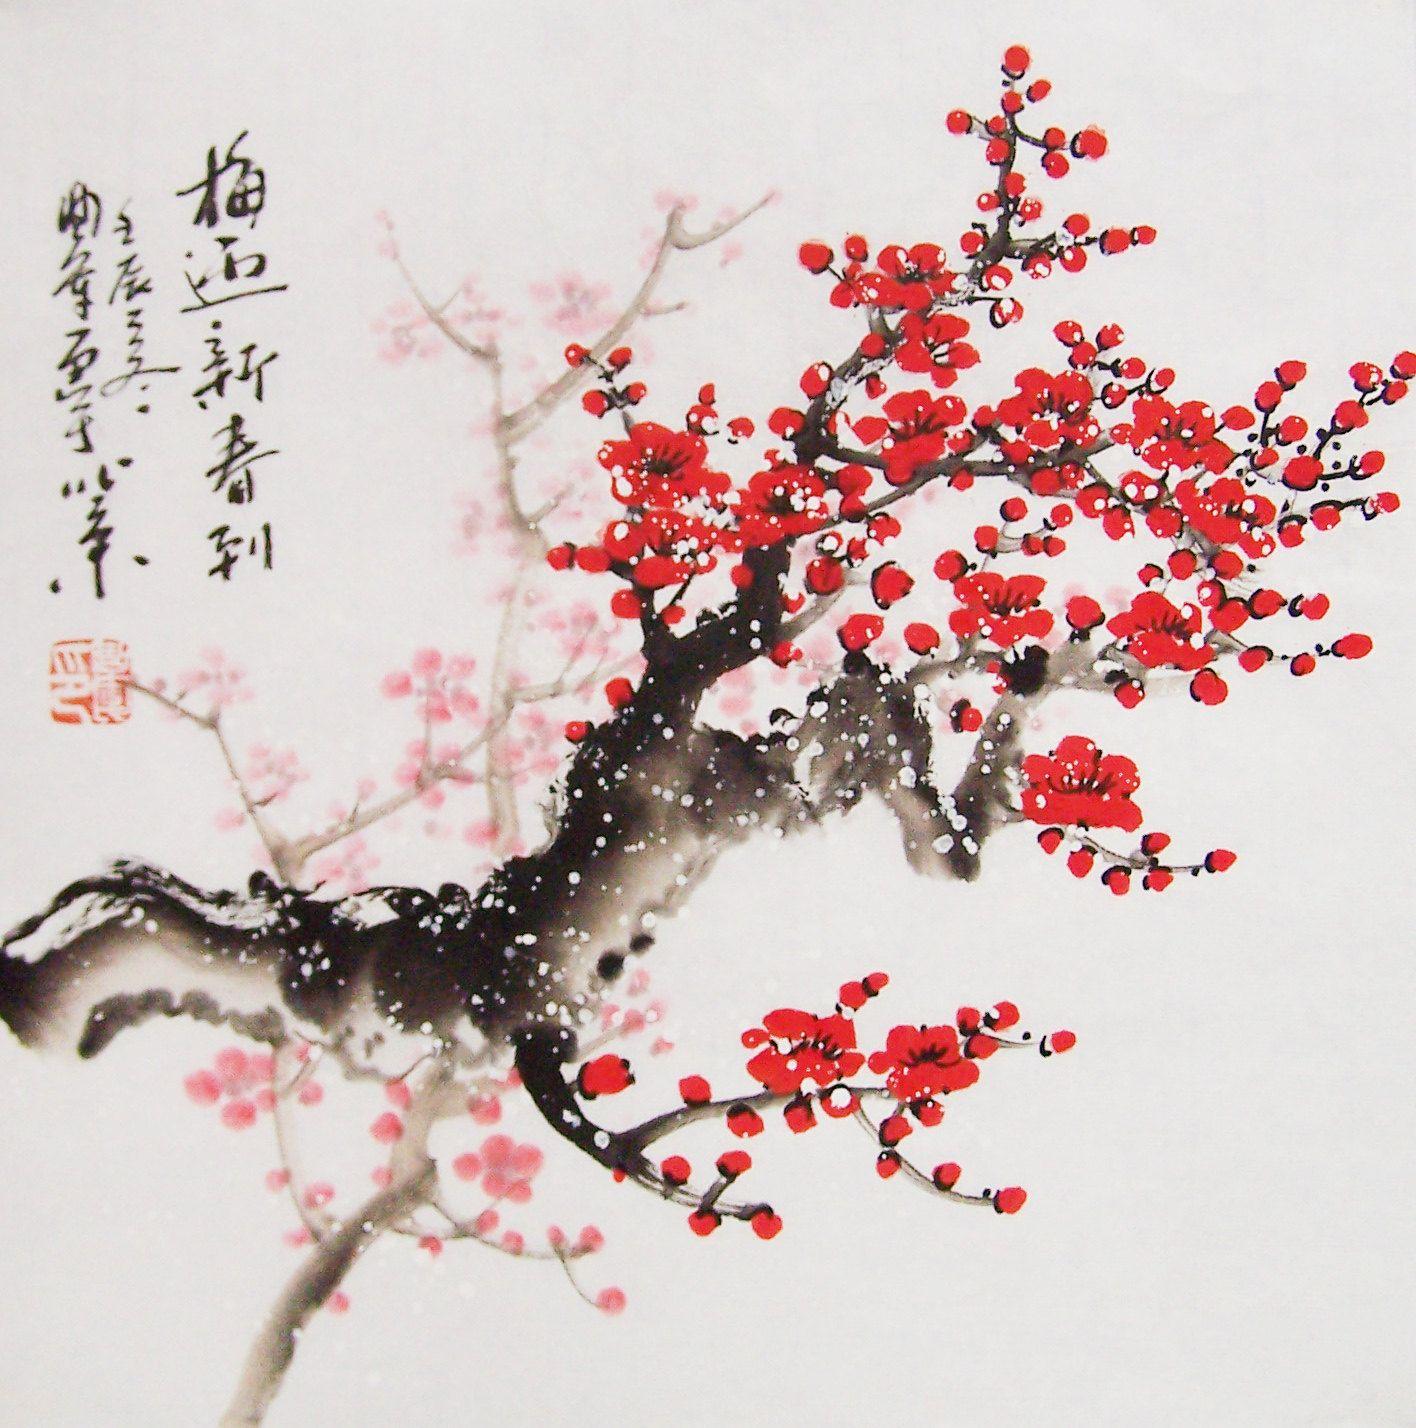 Cherry Blossom Tattoo Google Search Cherry Blossom Painting Cherry Blossom Art Cherry Blossom Drawing